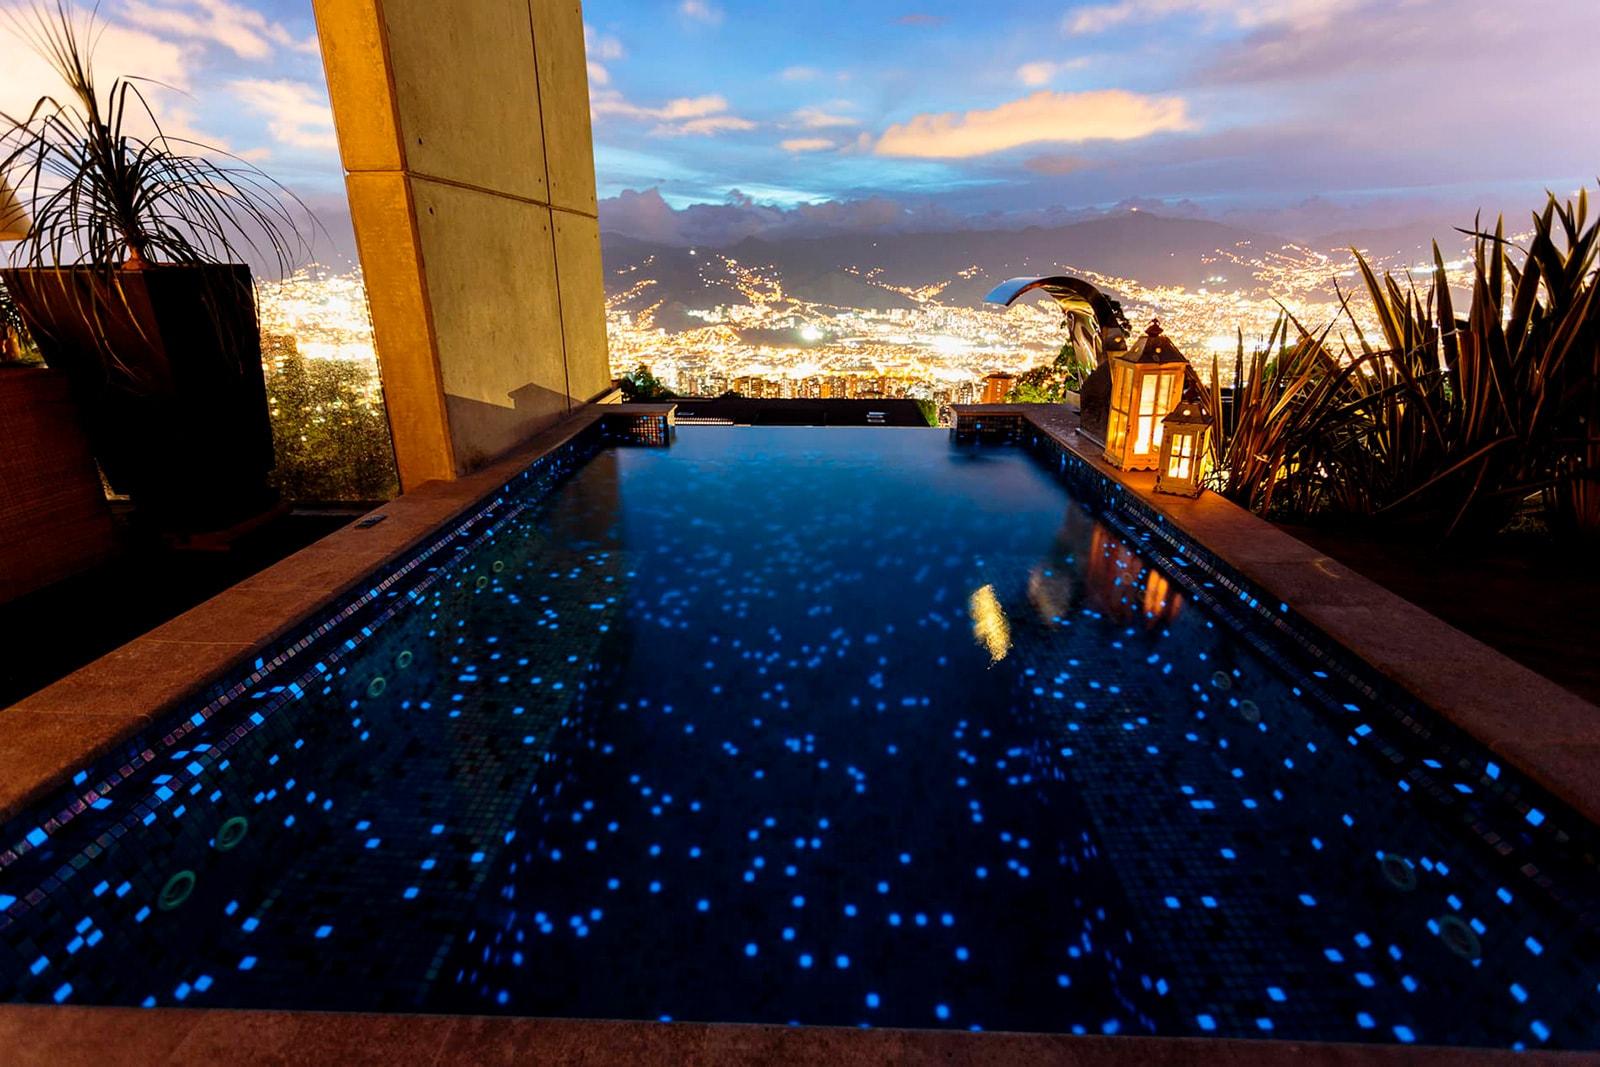 swimming pool tiles ezarri